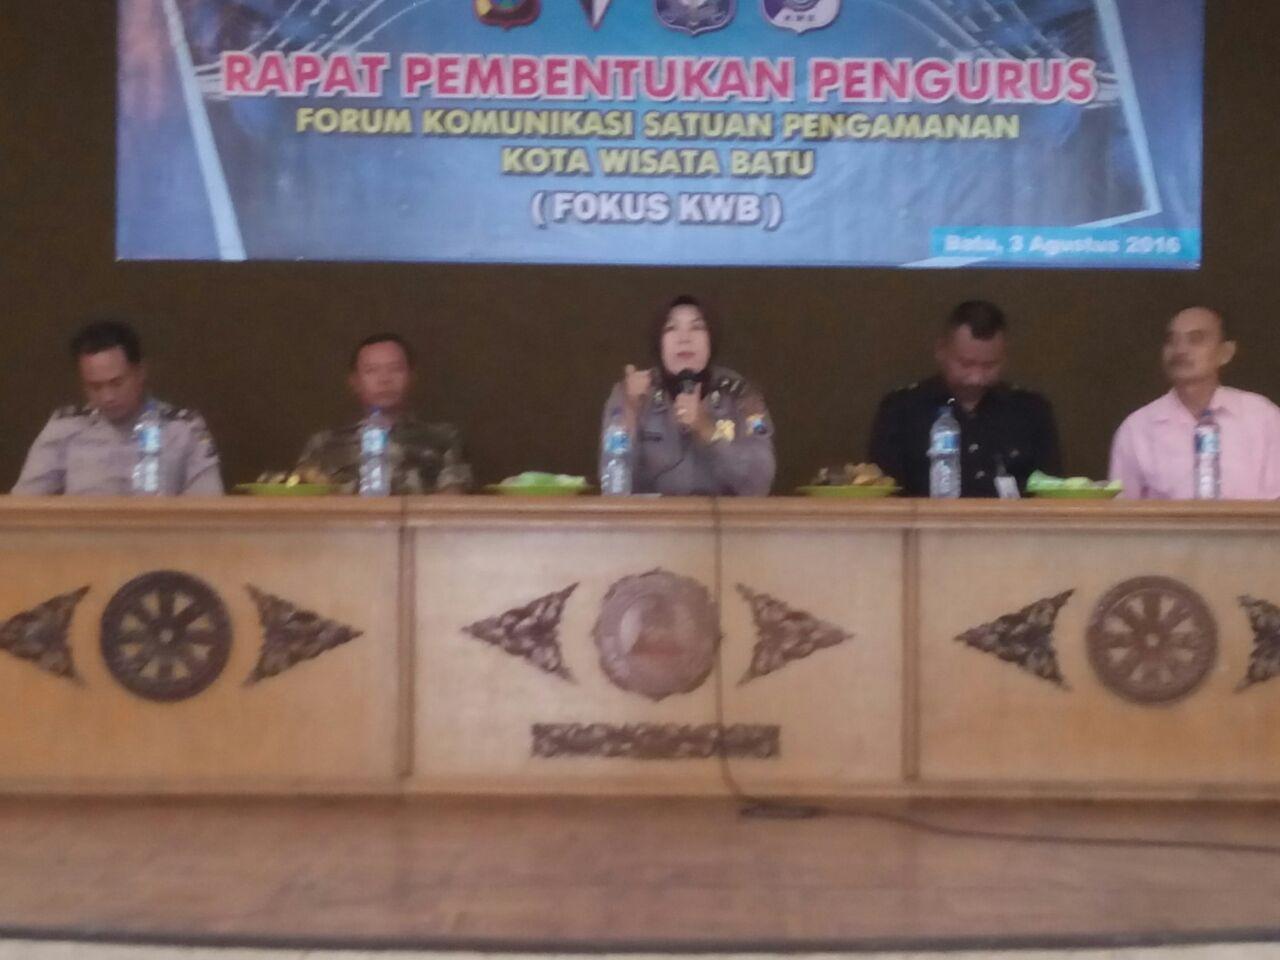 Koordinasi pembentukan pengurus definitif Forum Komunikasi Satpam Kota Wisata Batu ( FOKUS KWB).